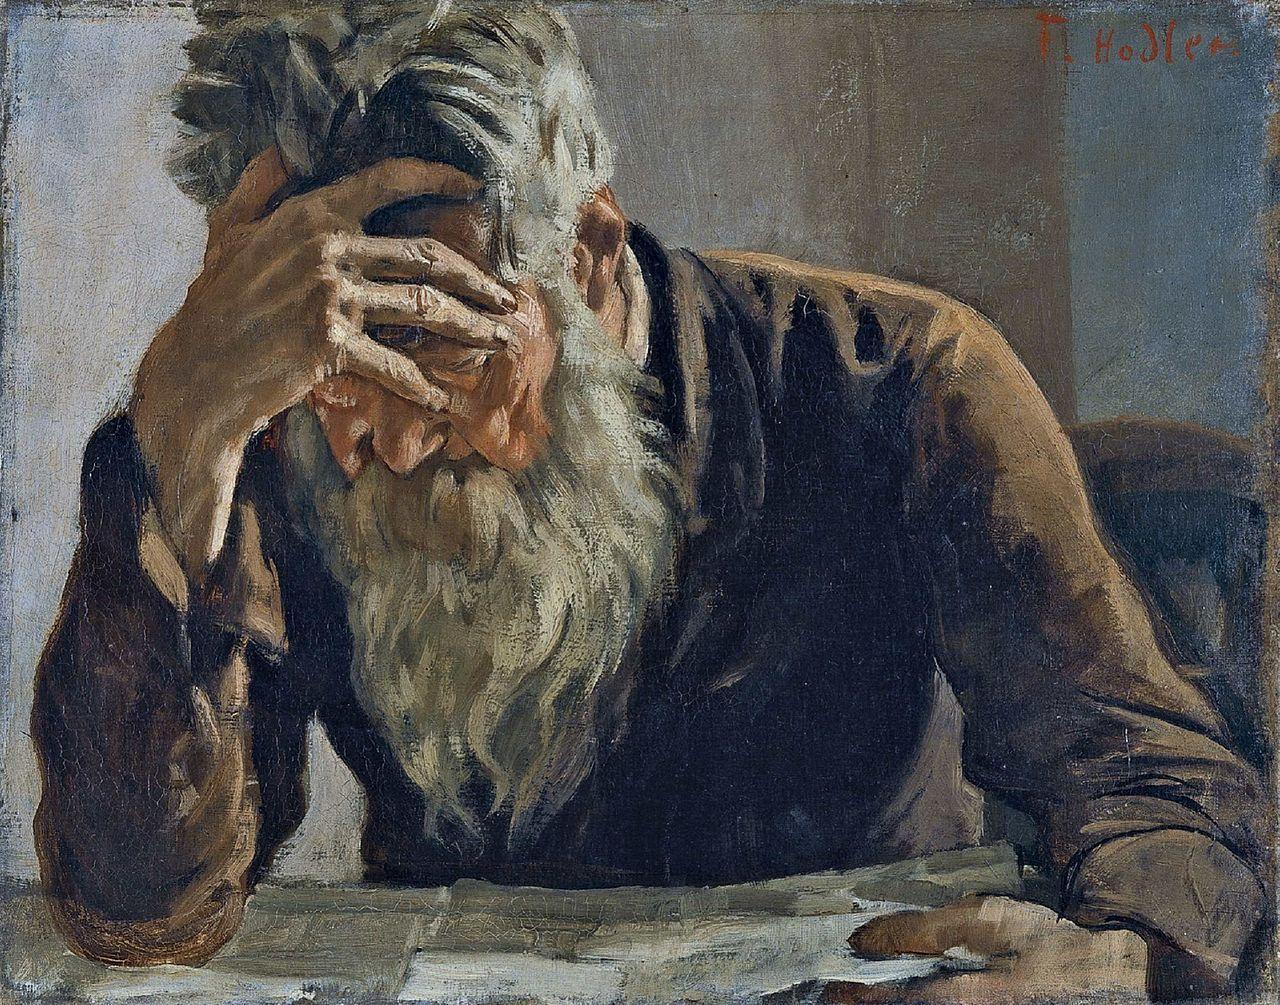 Ferdinand Hodler: The Reader, 1885. de 2019 | Pinturas clássicas ...